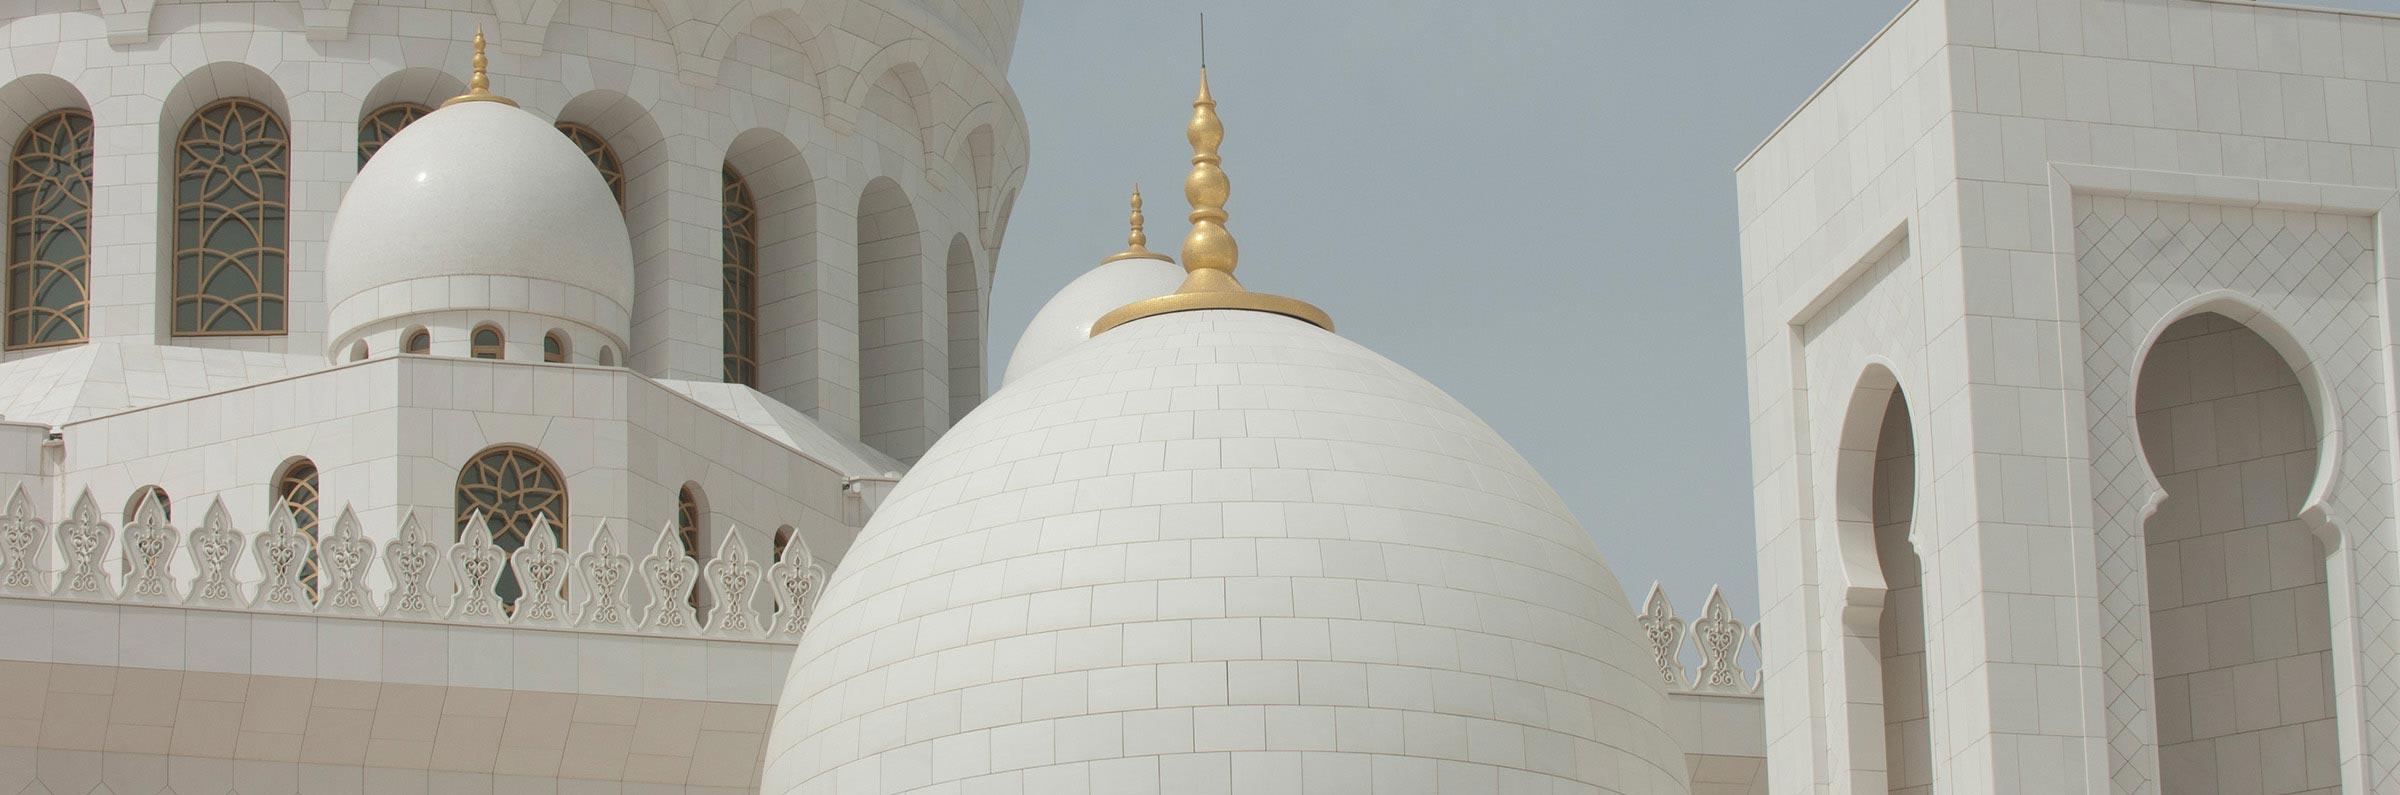 Viaje de un da in Dubi